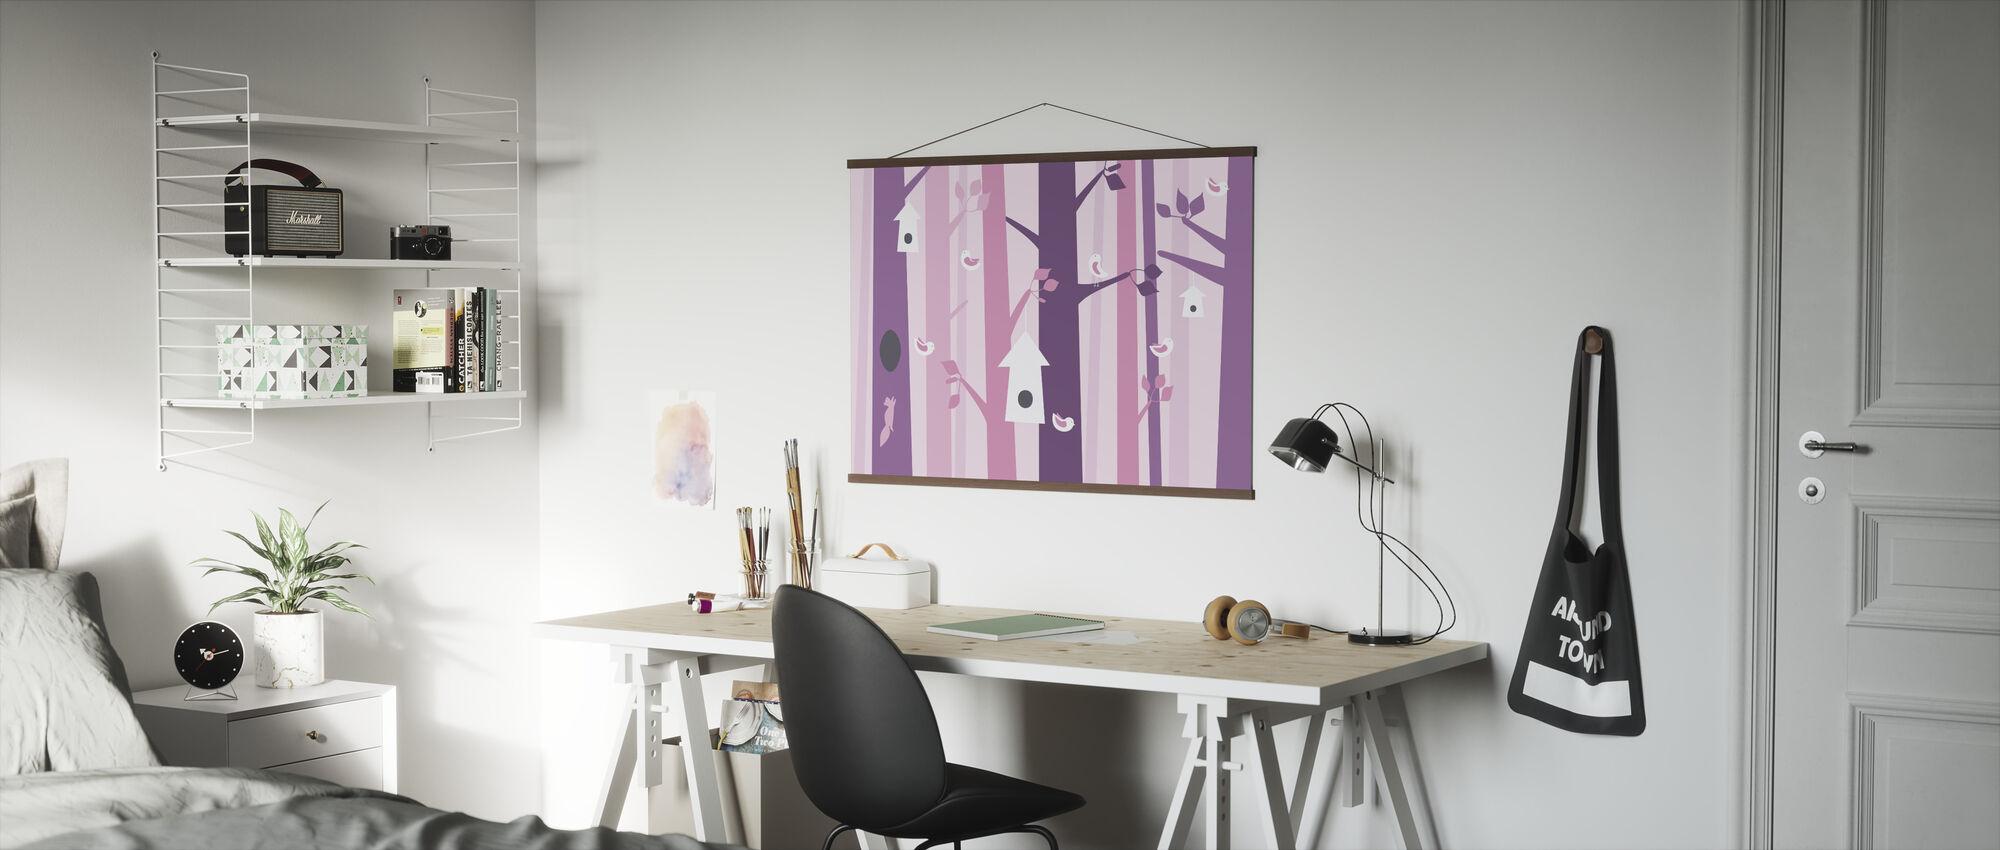 Birdforest - Rosa - Plakat - Kontor